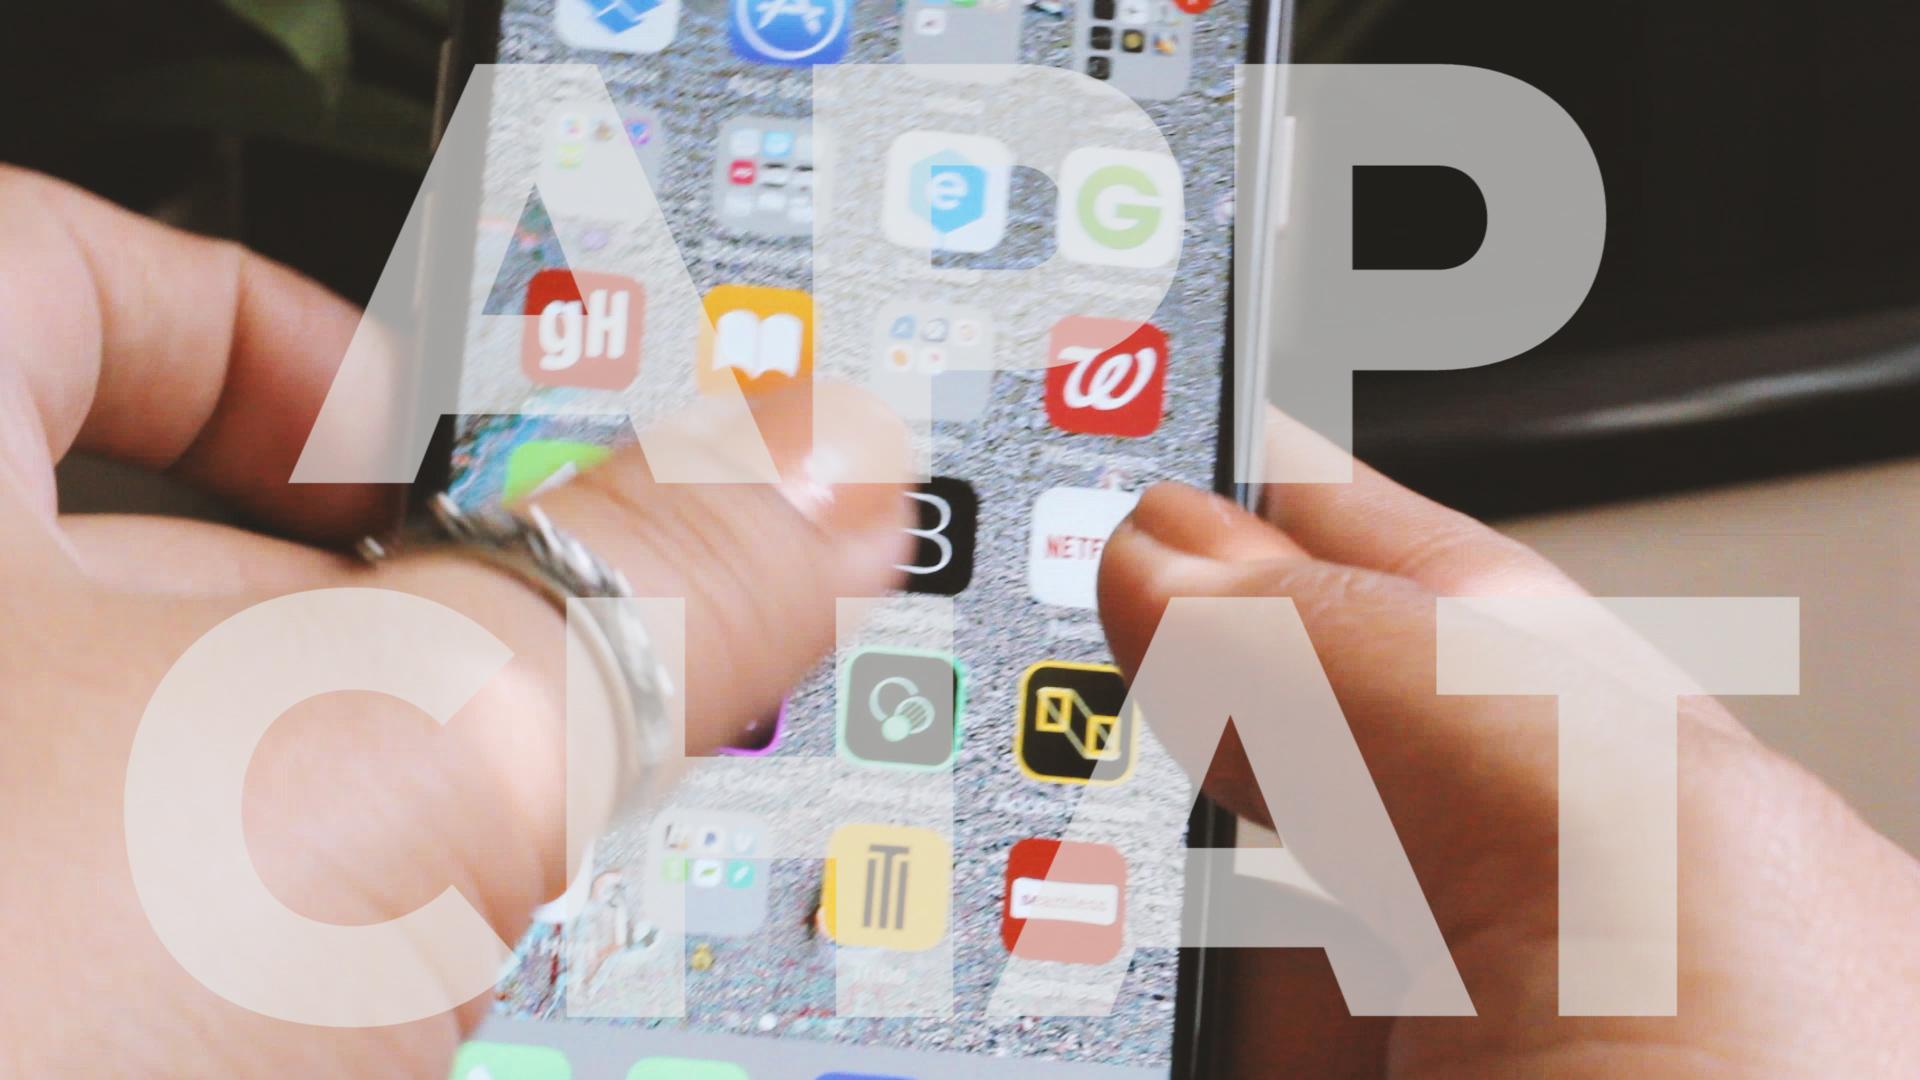 app_chat_mobile_app_reviews.jpg